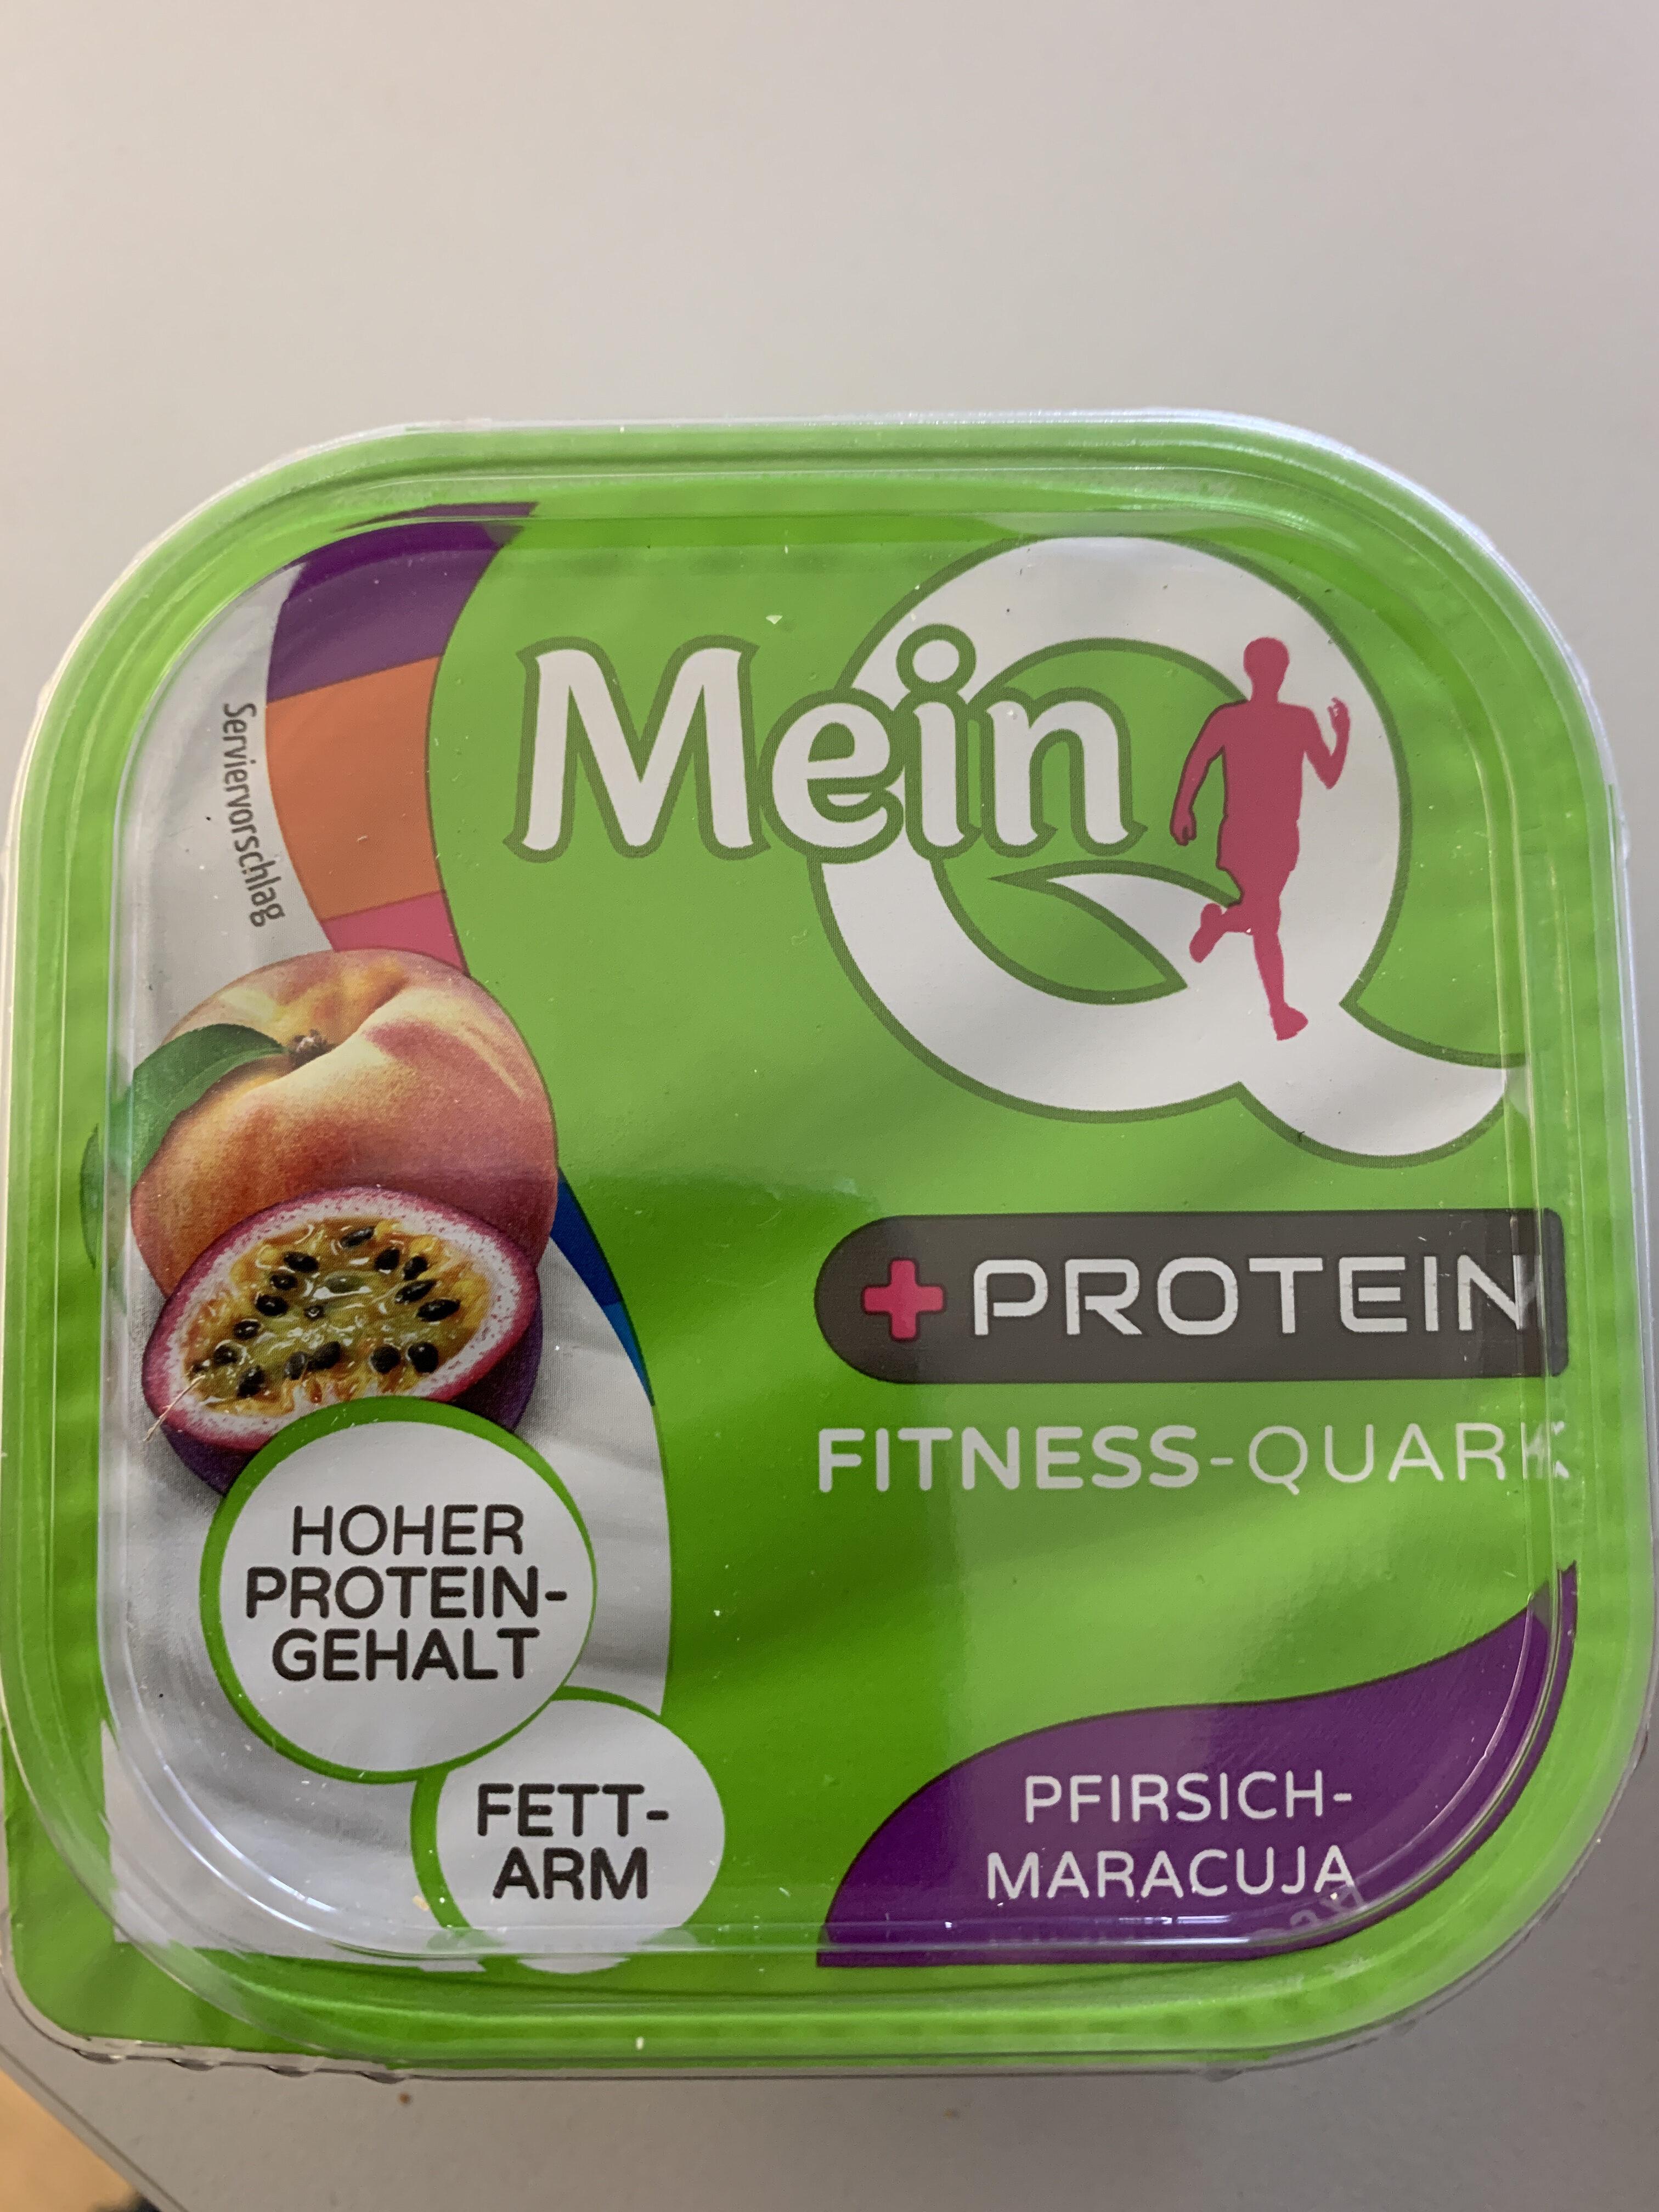 MeinQ Fitness-Quark - Product